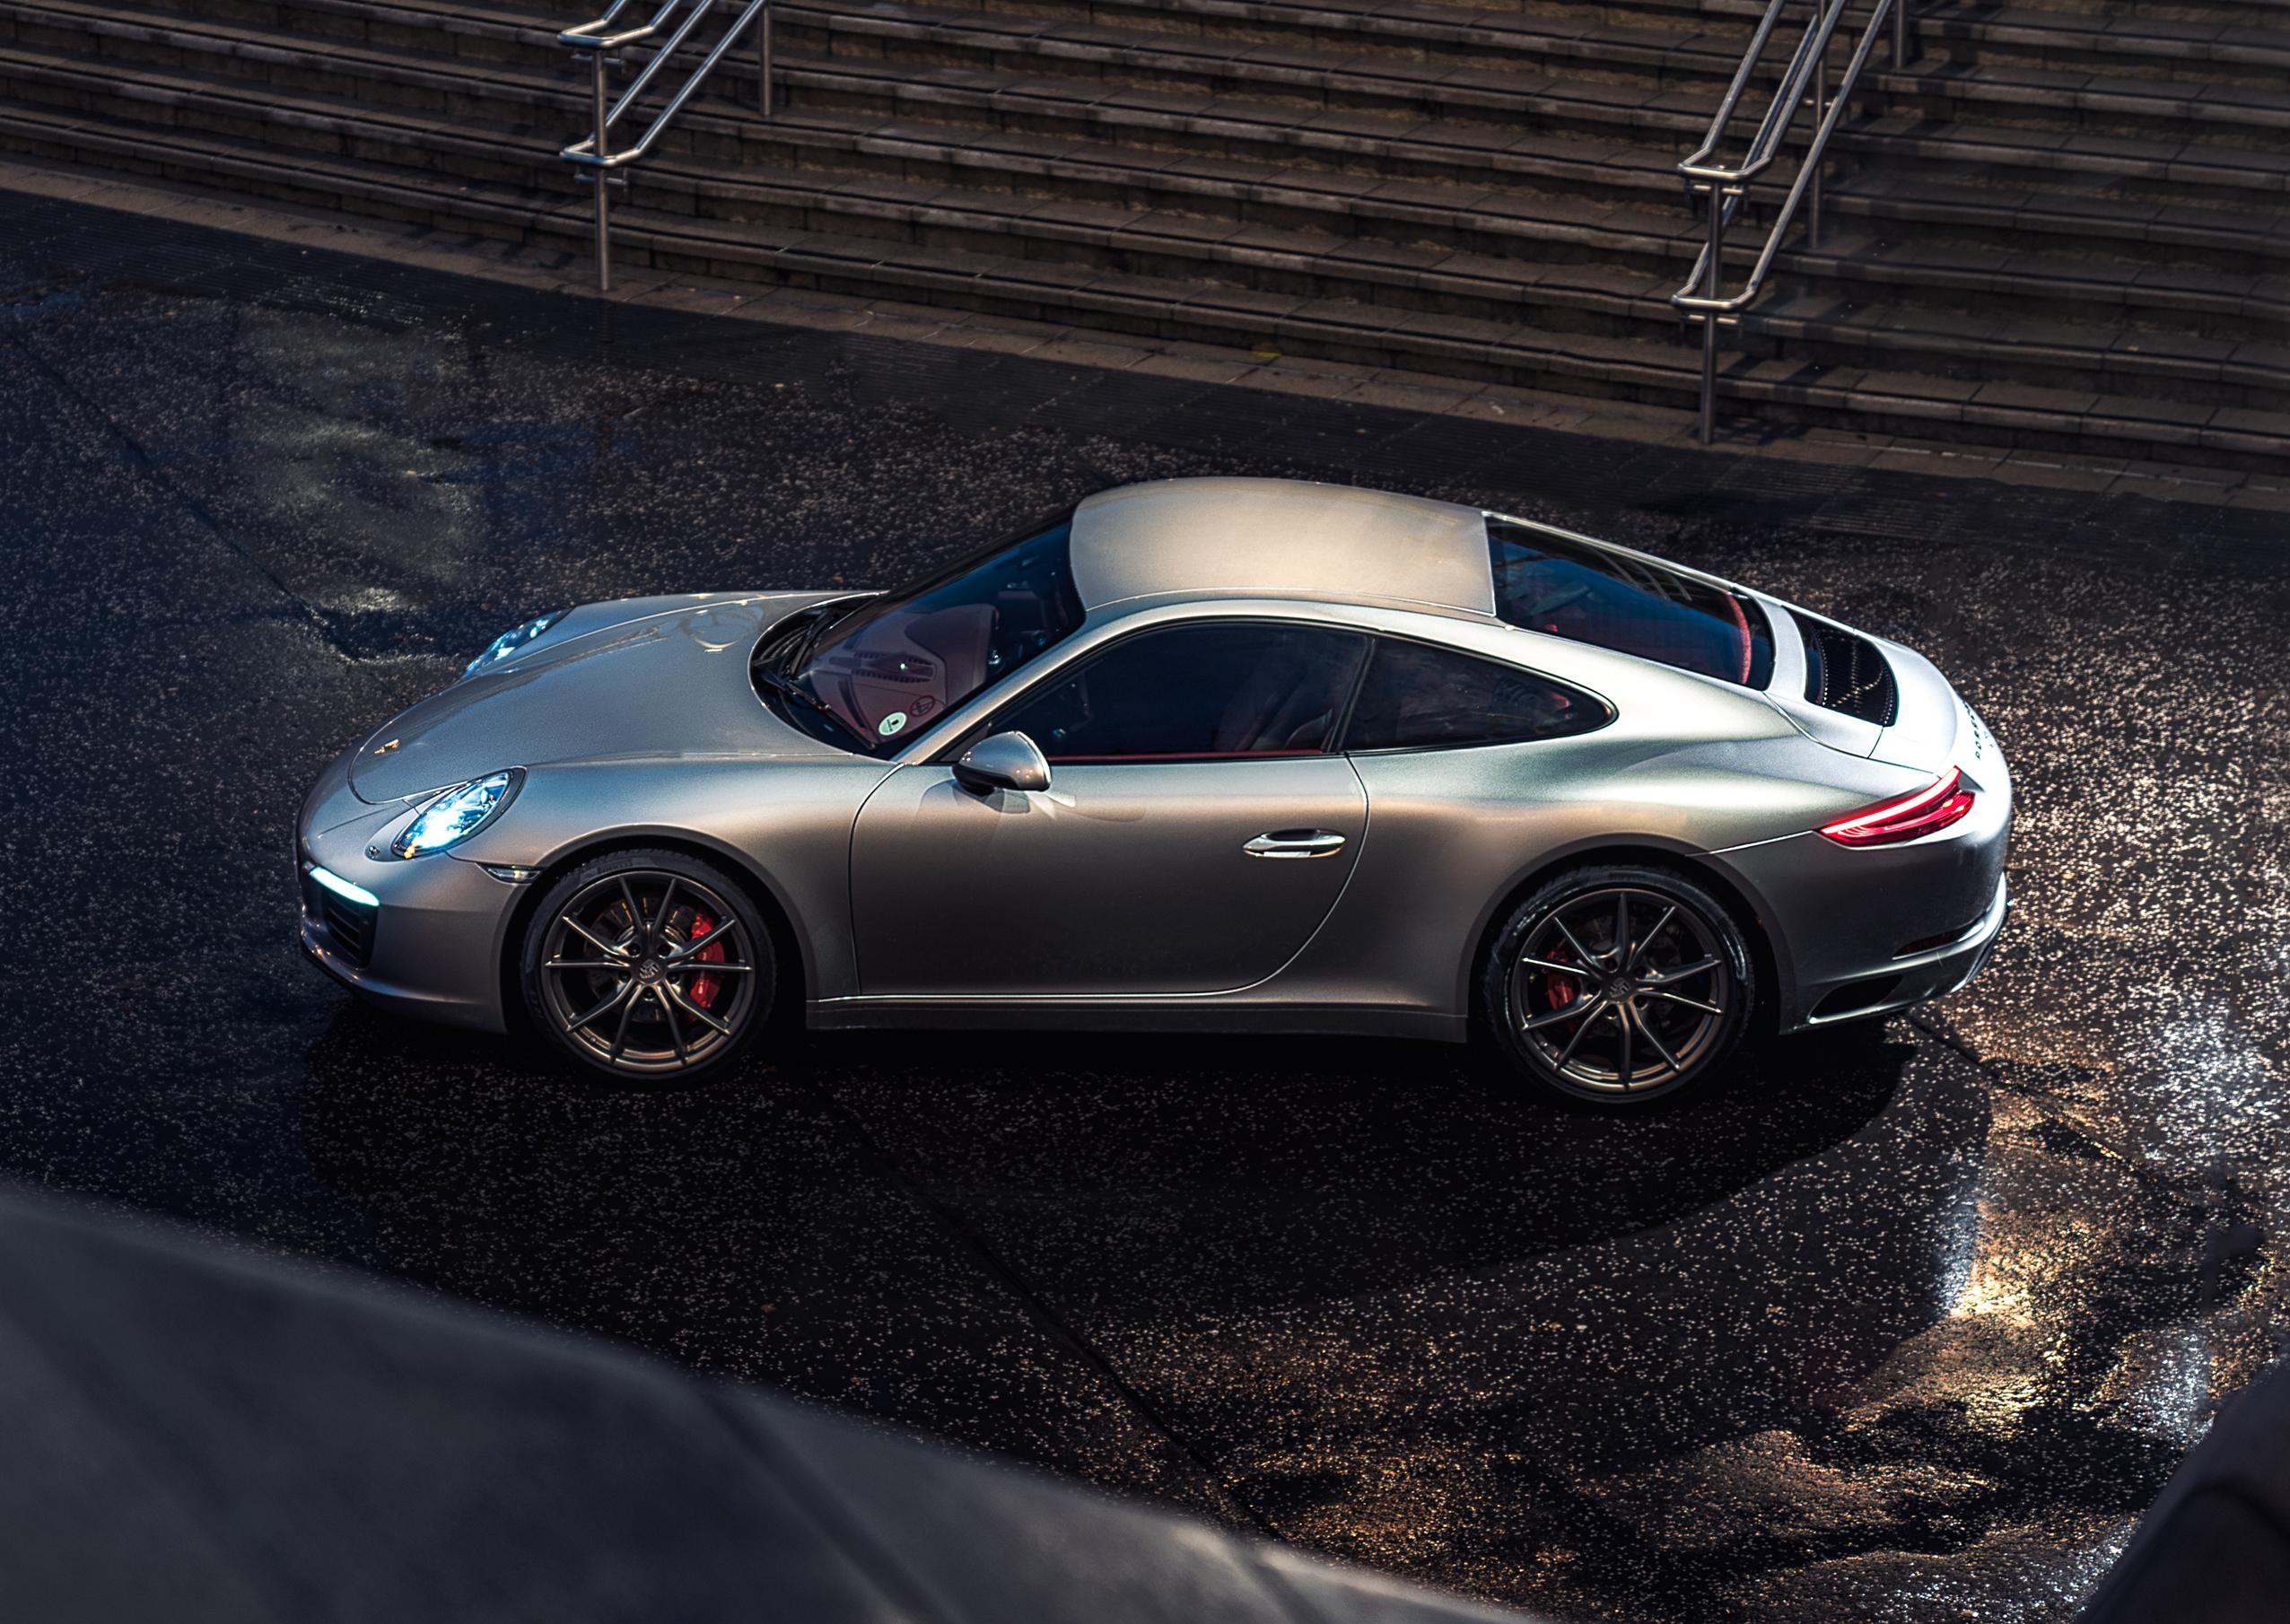 2016-porsche-911-carrera-s-coupe Outstanding Porsche 911 Gt2 Wheel Au Cars Trend